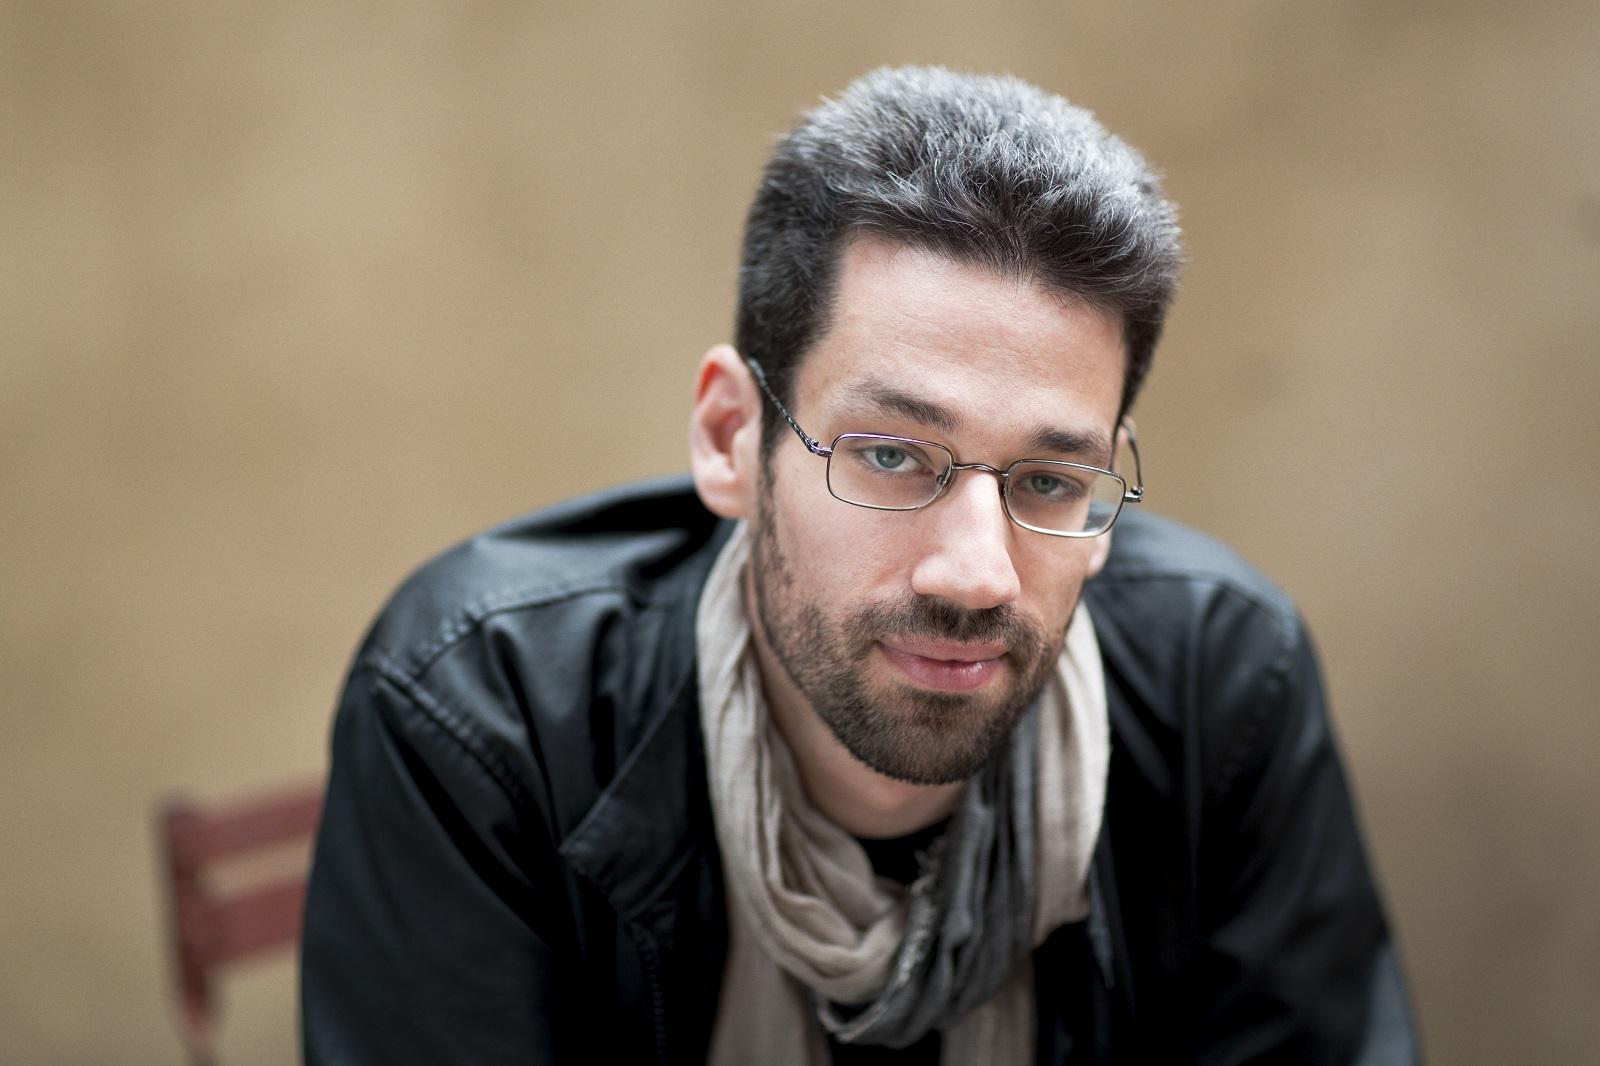 Pianist Jonathan Biss will perform at Lippes Hall at the University of Buffalo. (Photo by Benjamin Ealovega)